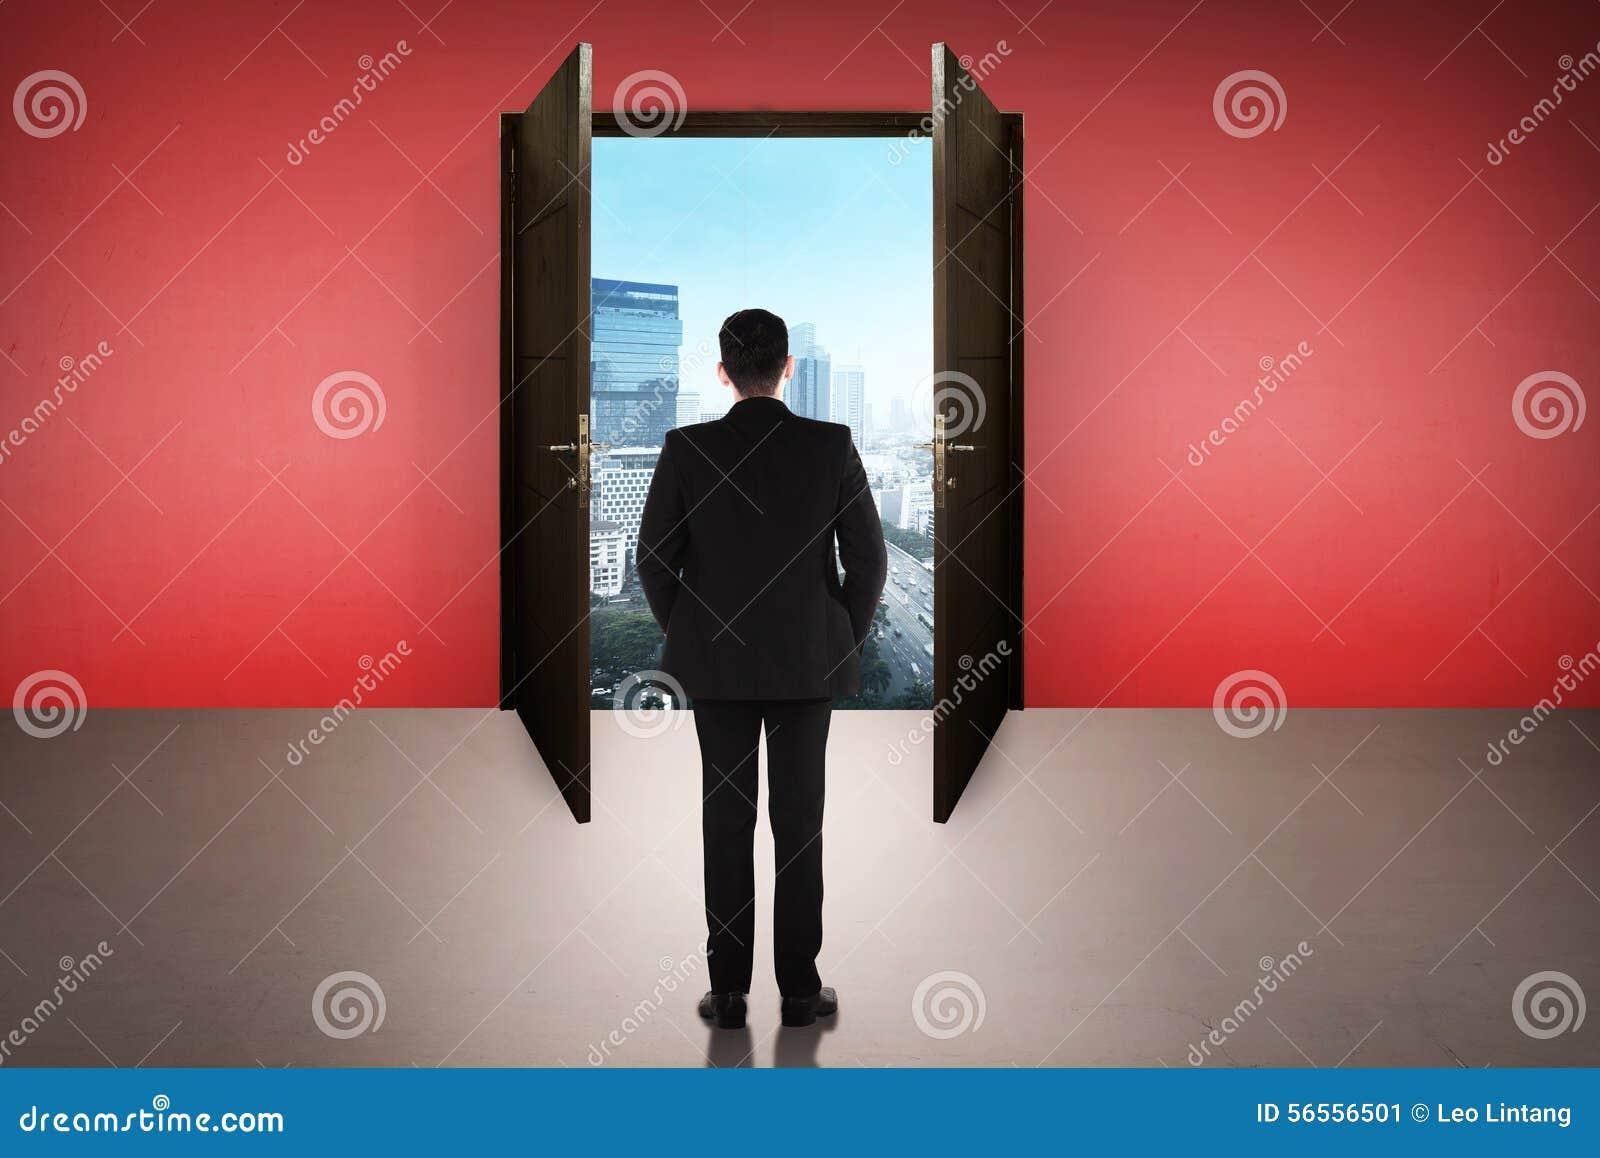 Download Επιχειρησιακό άτομο που πηγαίνει στη ανοιχτή πόρτα Στοκ Εικόνα - εικόνα από εννοιολογικός, επιχείρηση: 56556501